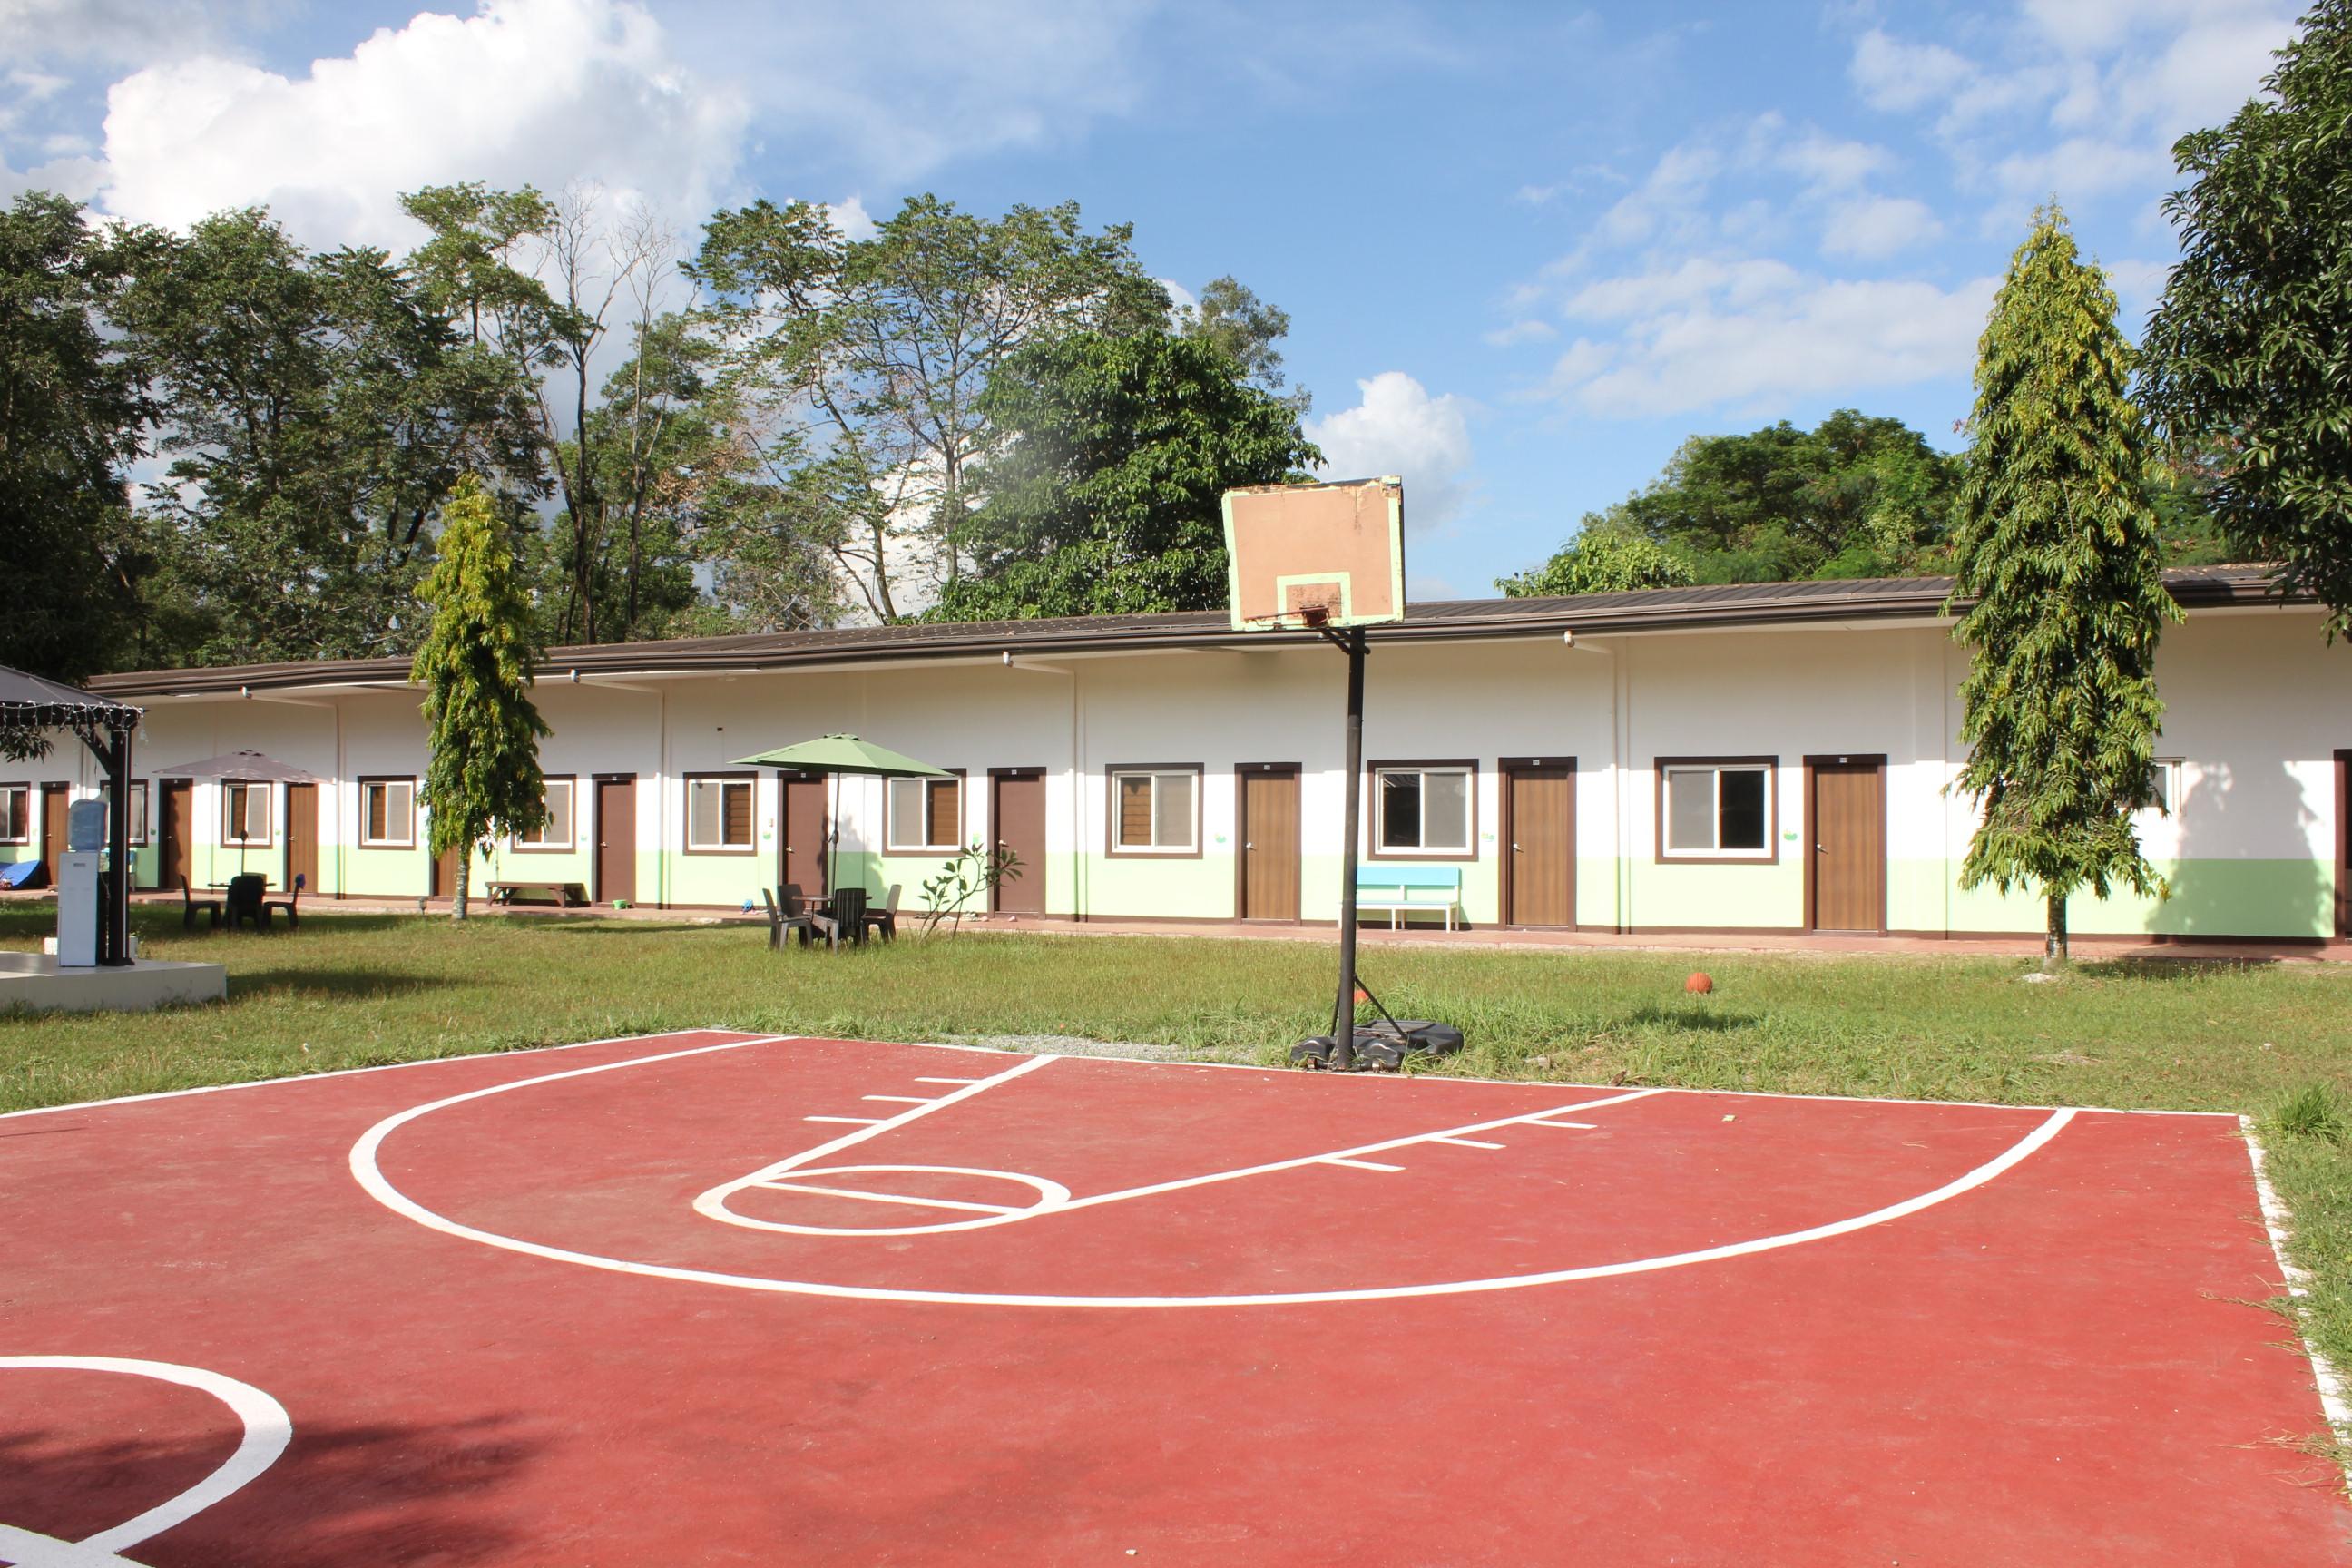 basketball court (2)